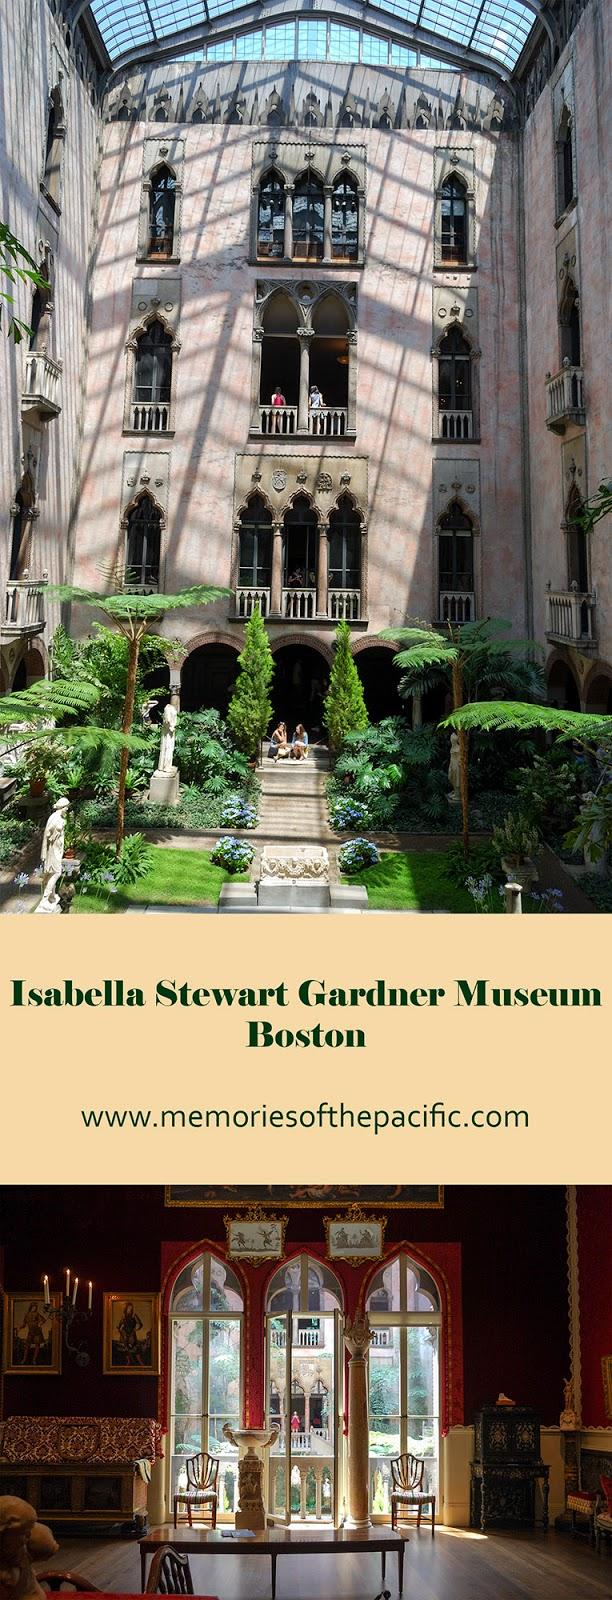 Isabella Stewart Gardner Museum Boston Venetian style palace art collection